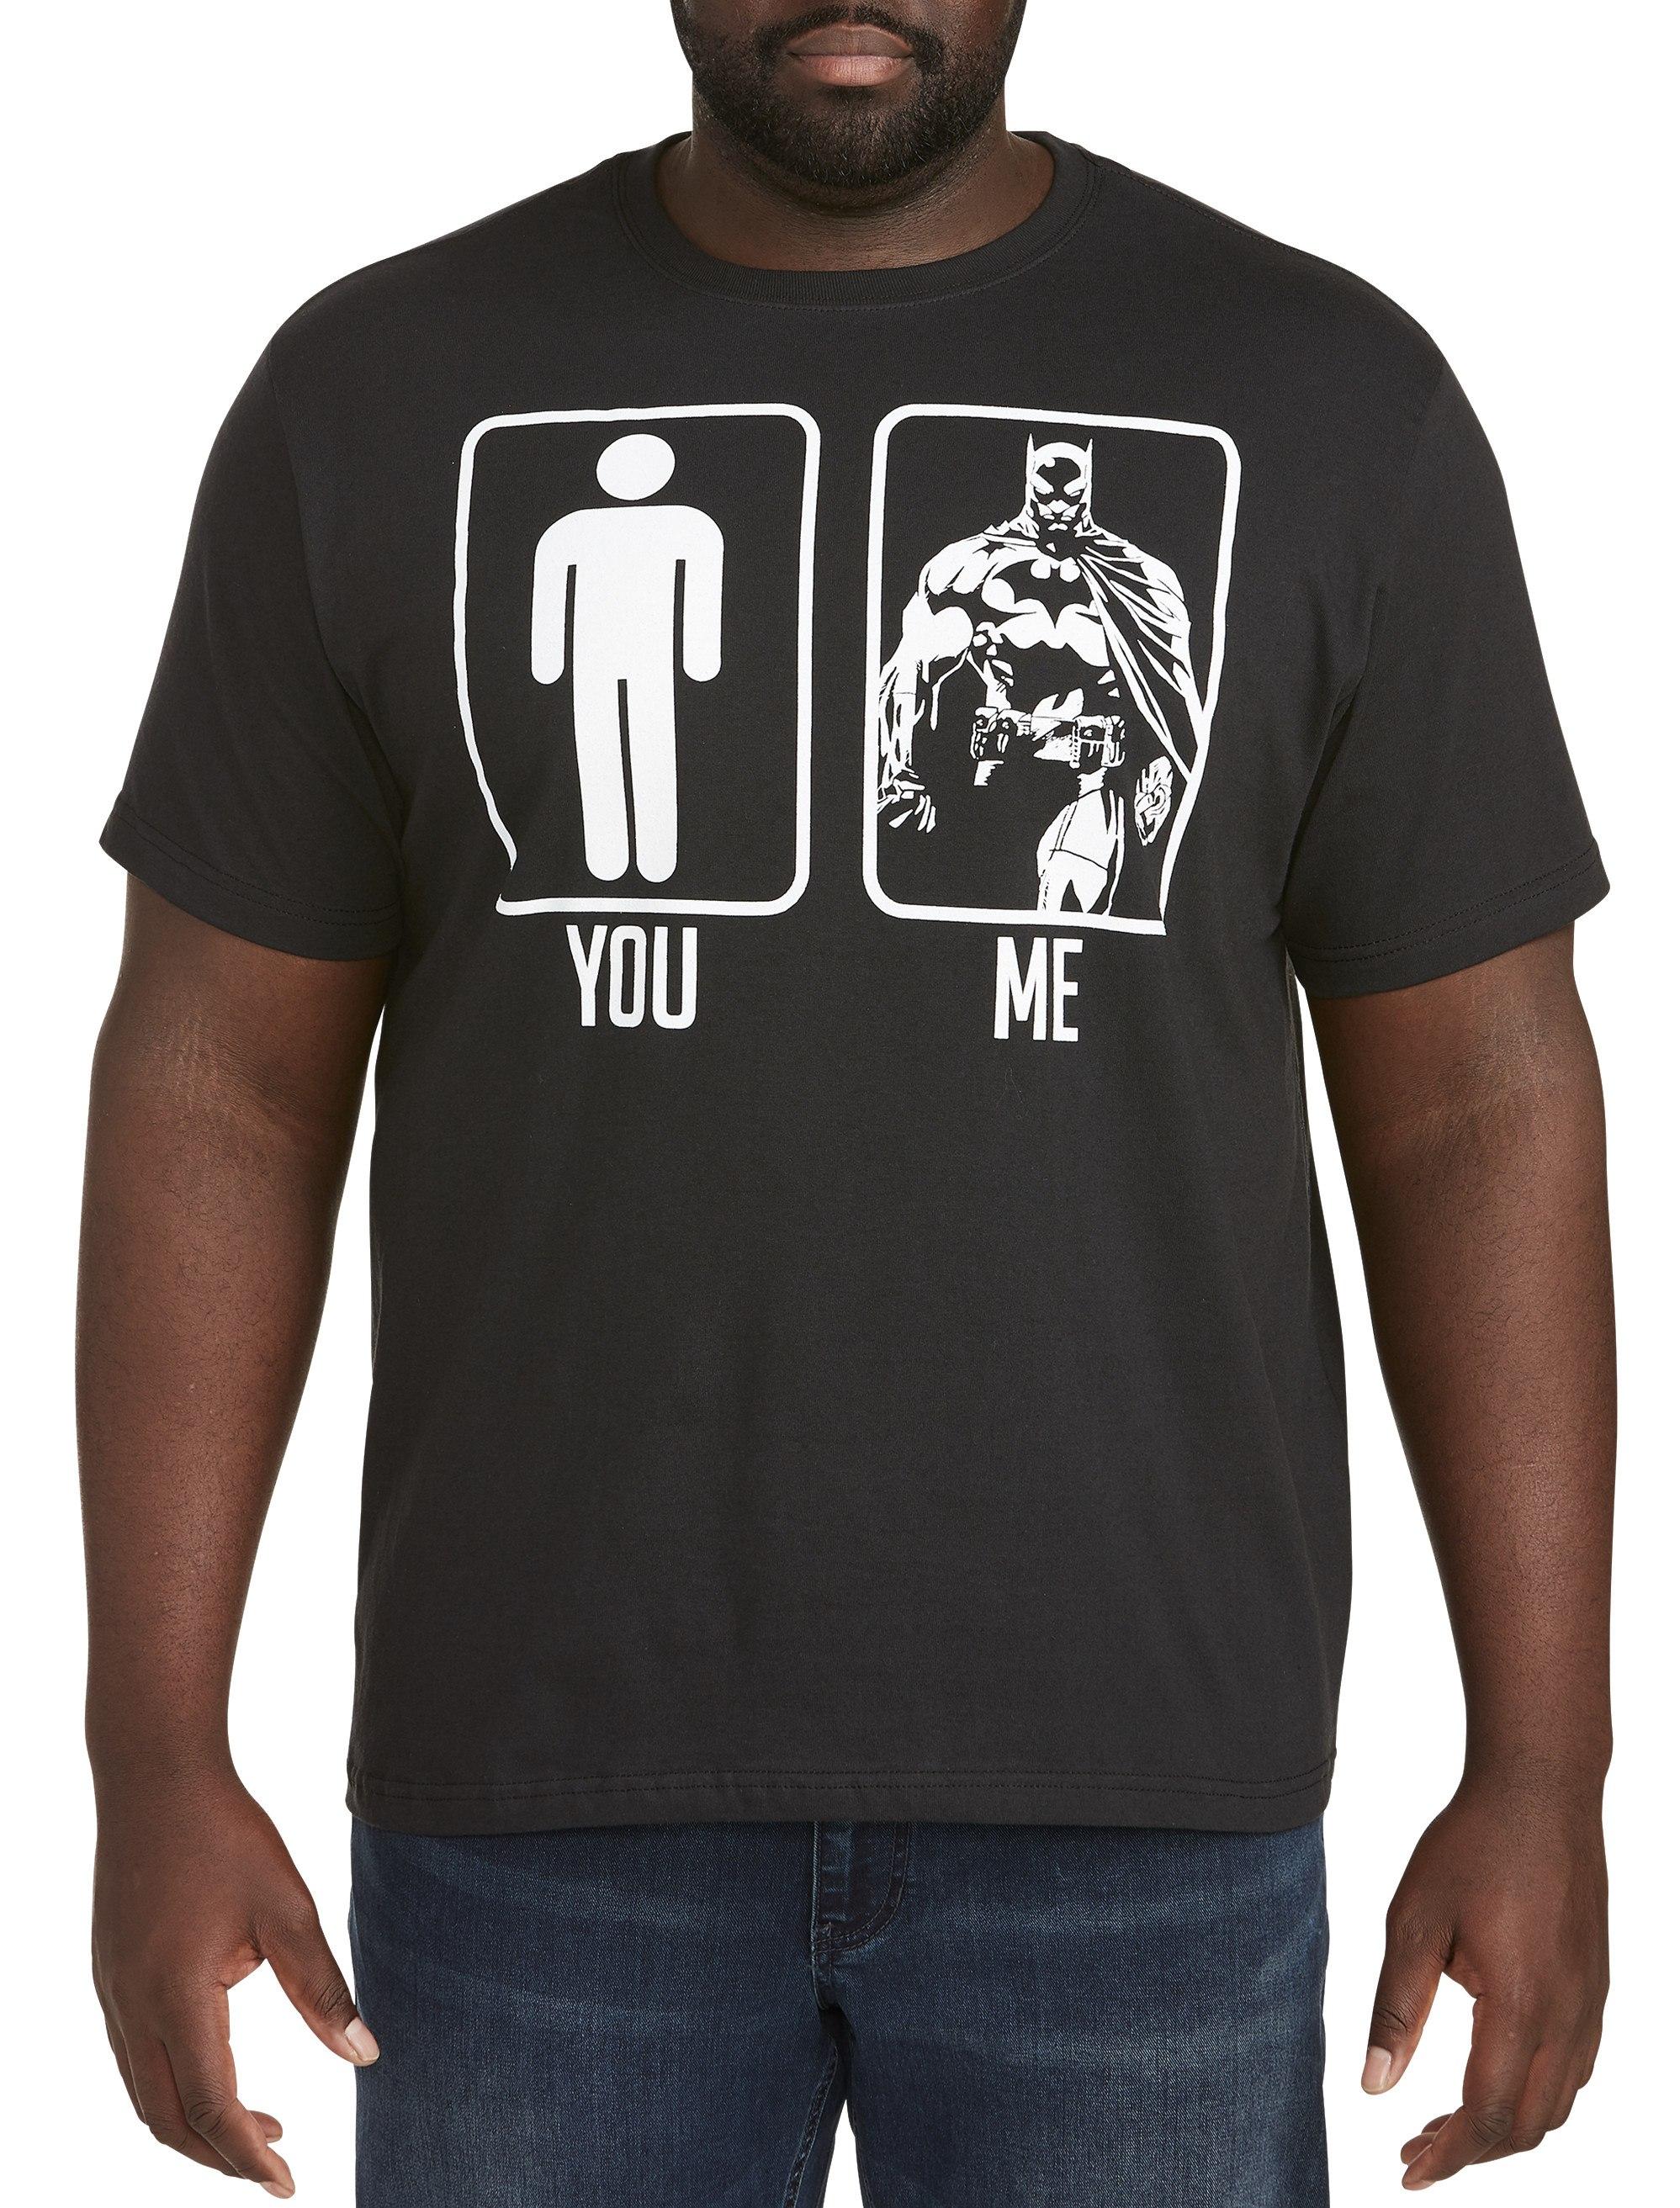 The Bat Big and Tall Shirts Calligram Shirts Men/'s Big and Tall Graphic T-Shirt Men/'s Shirts